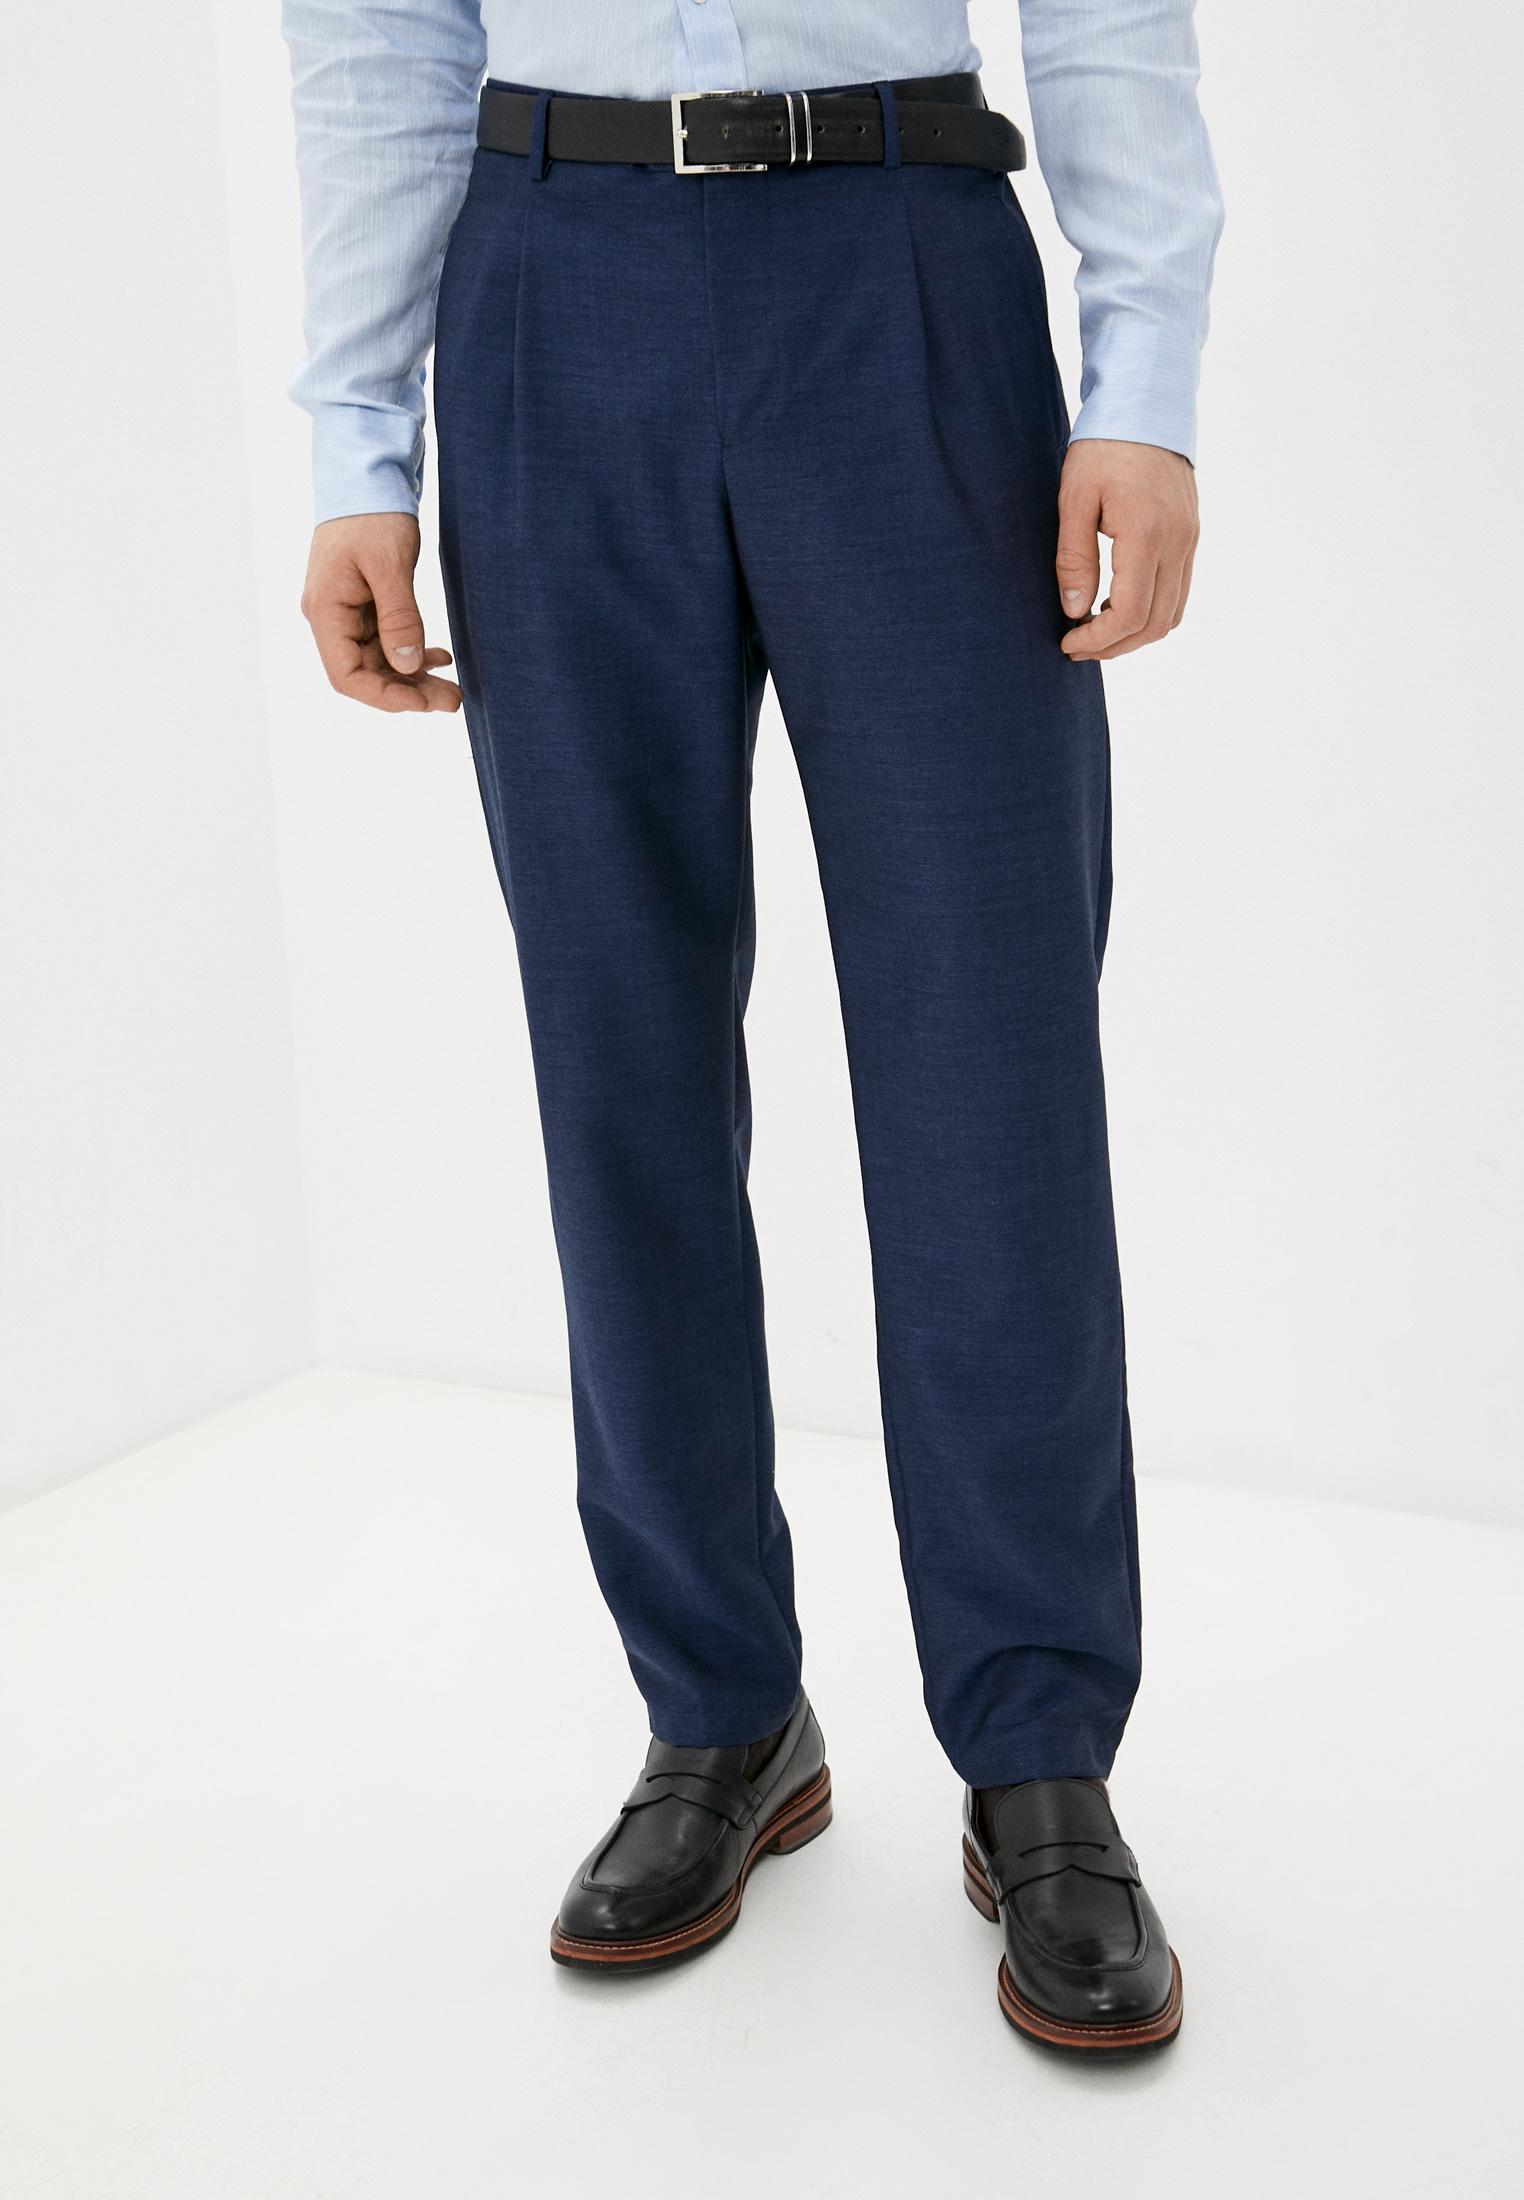 Мужские классические брюки Emporio Armani (Эмпорио Армани) W1P21A W1032